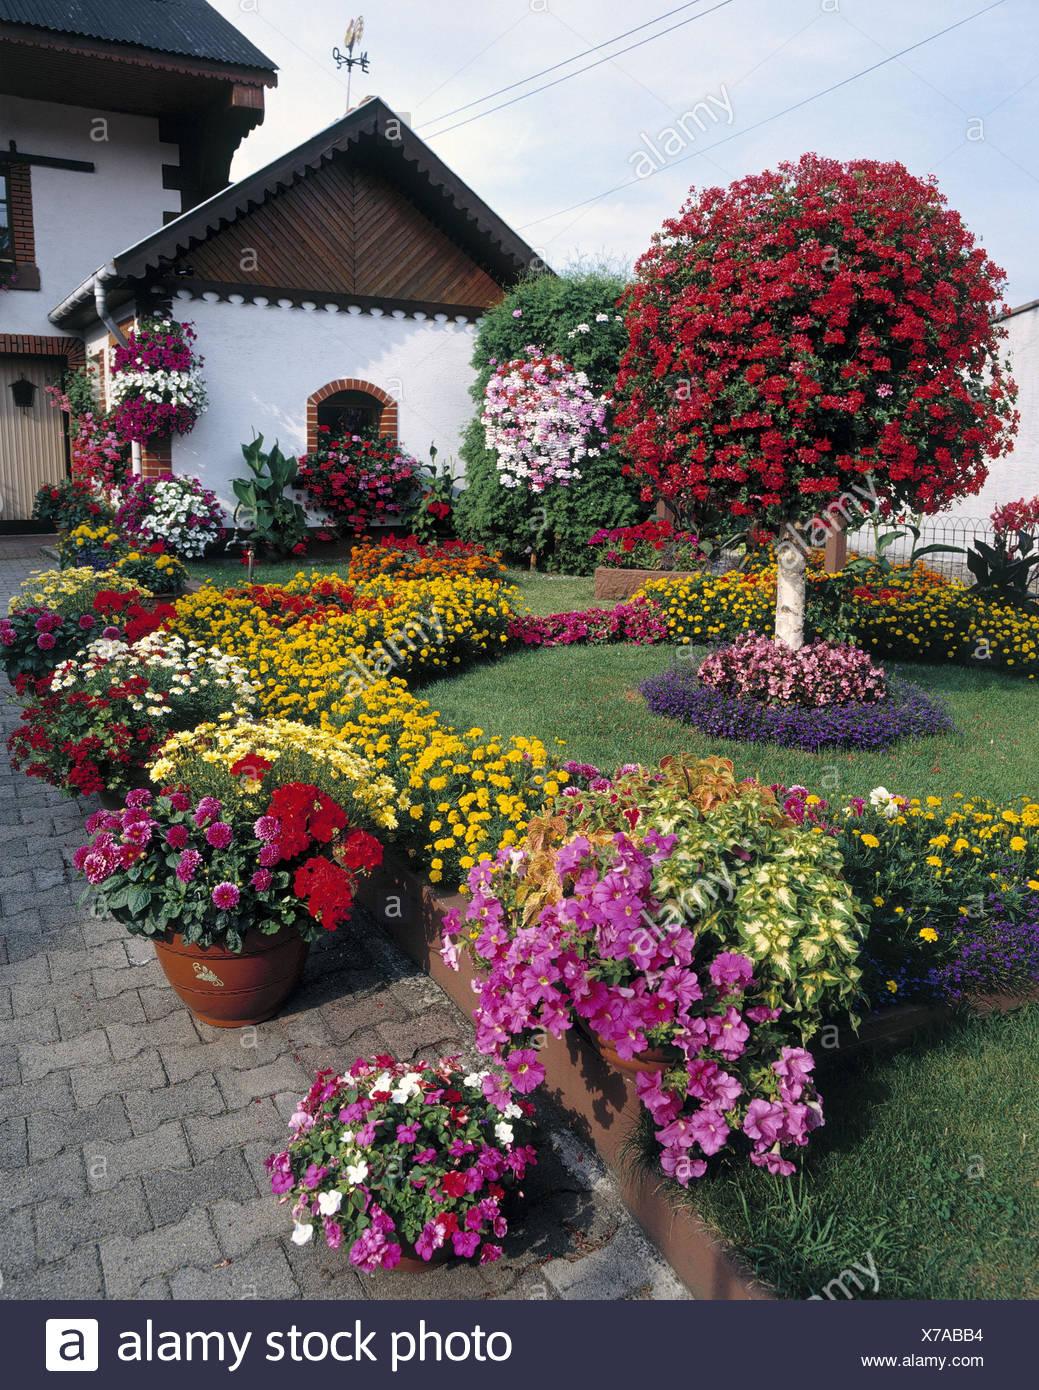 France, Alsace, residential house, garden, floral decoration